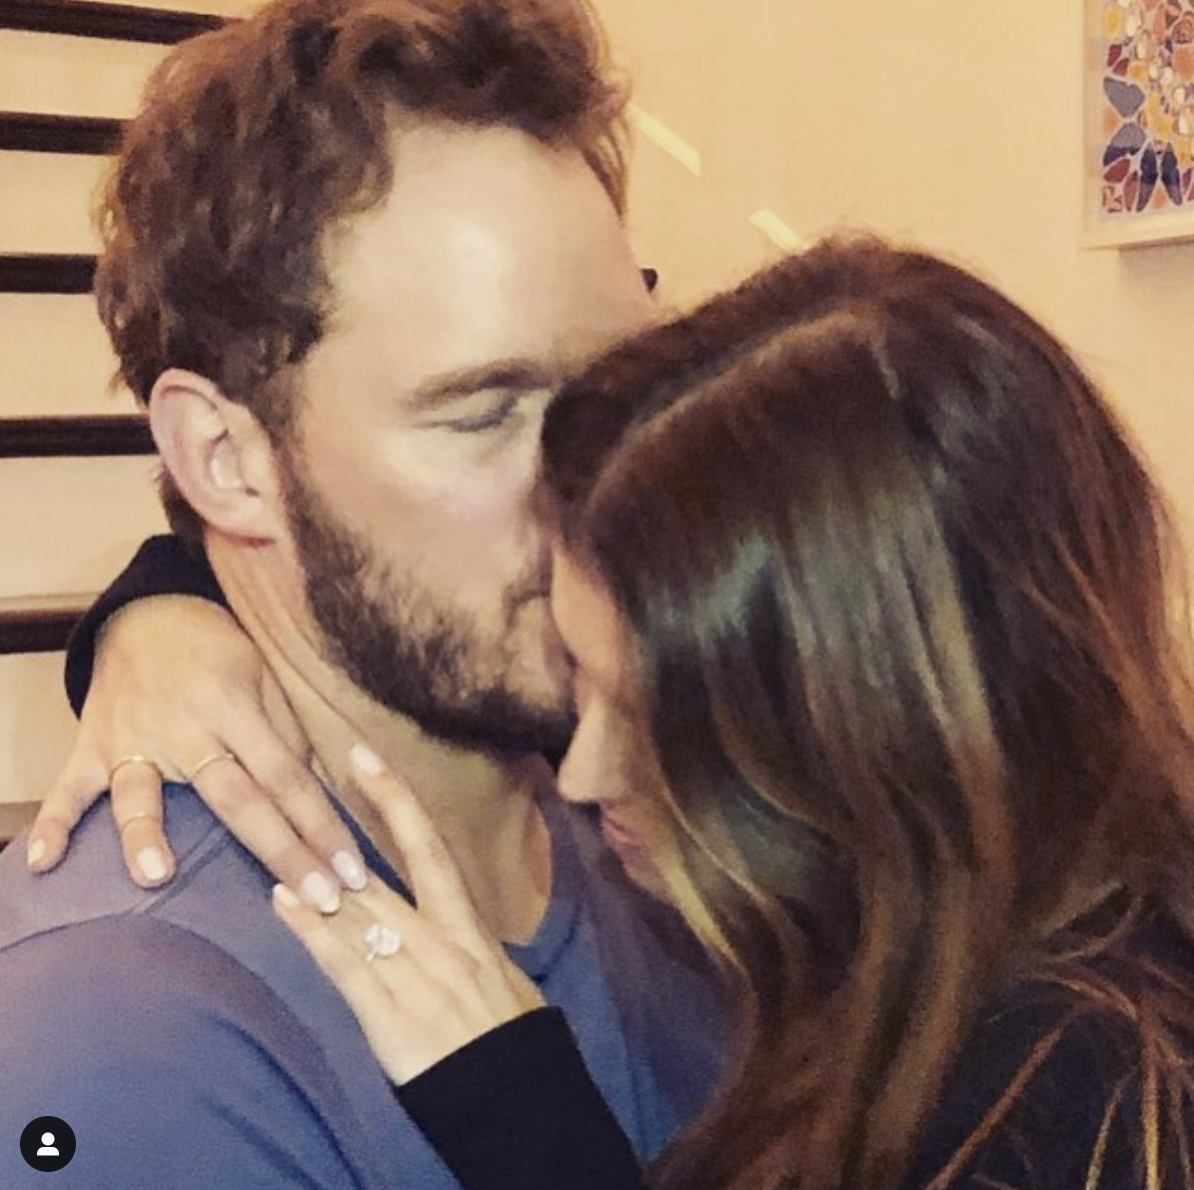 Chris Pratt anunció su compromiso con Katherine Schwarzenegger